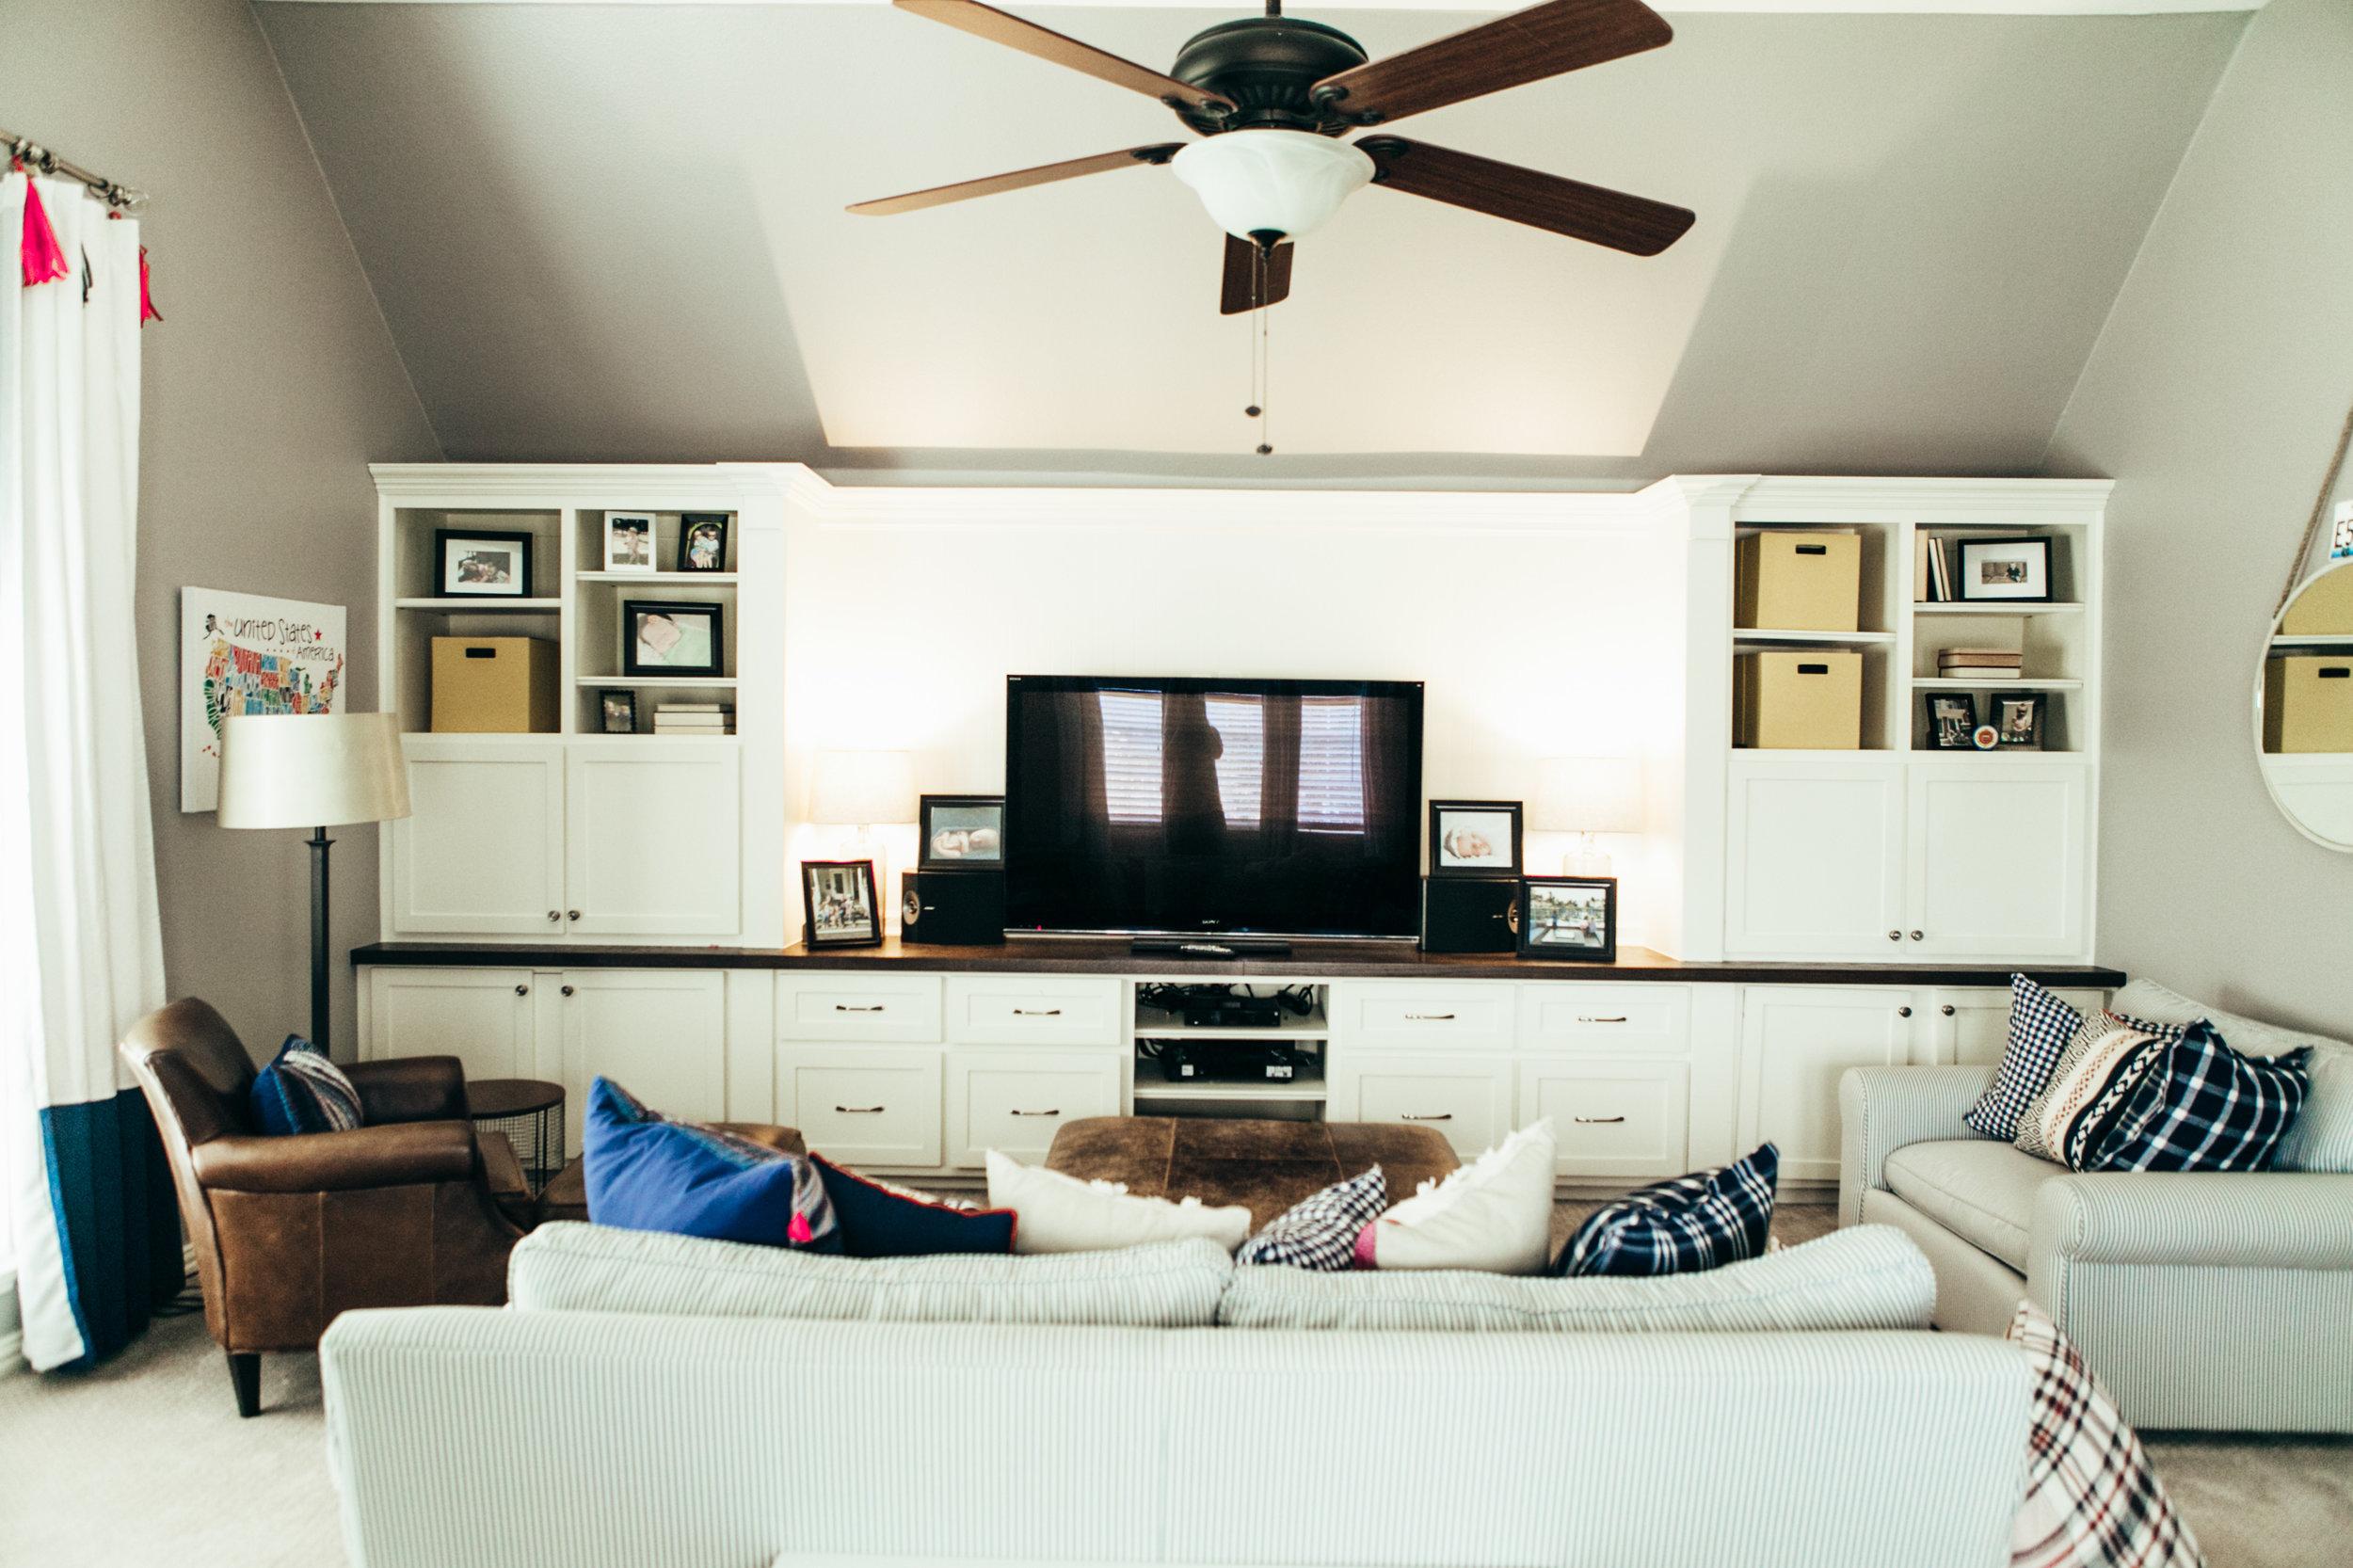 Playroom Interior Design5.jpg